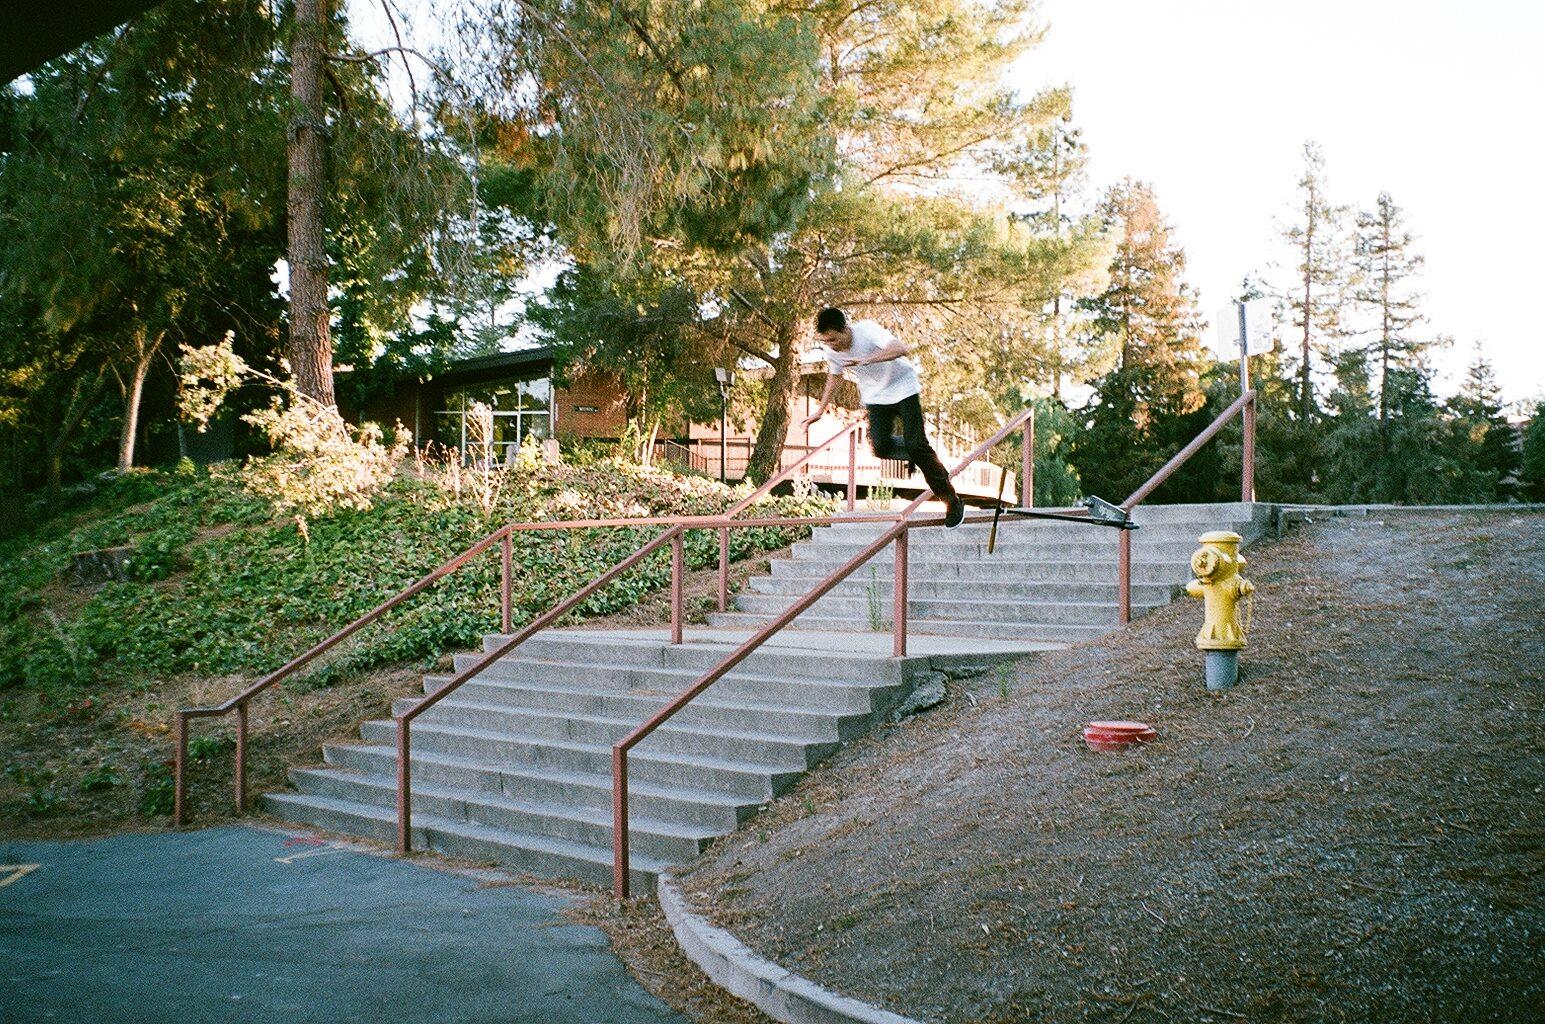 Kevin Closson